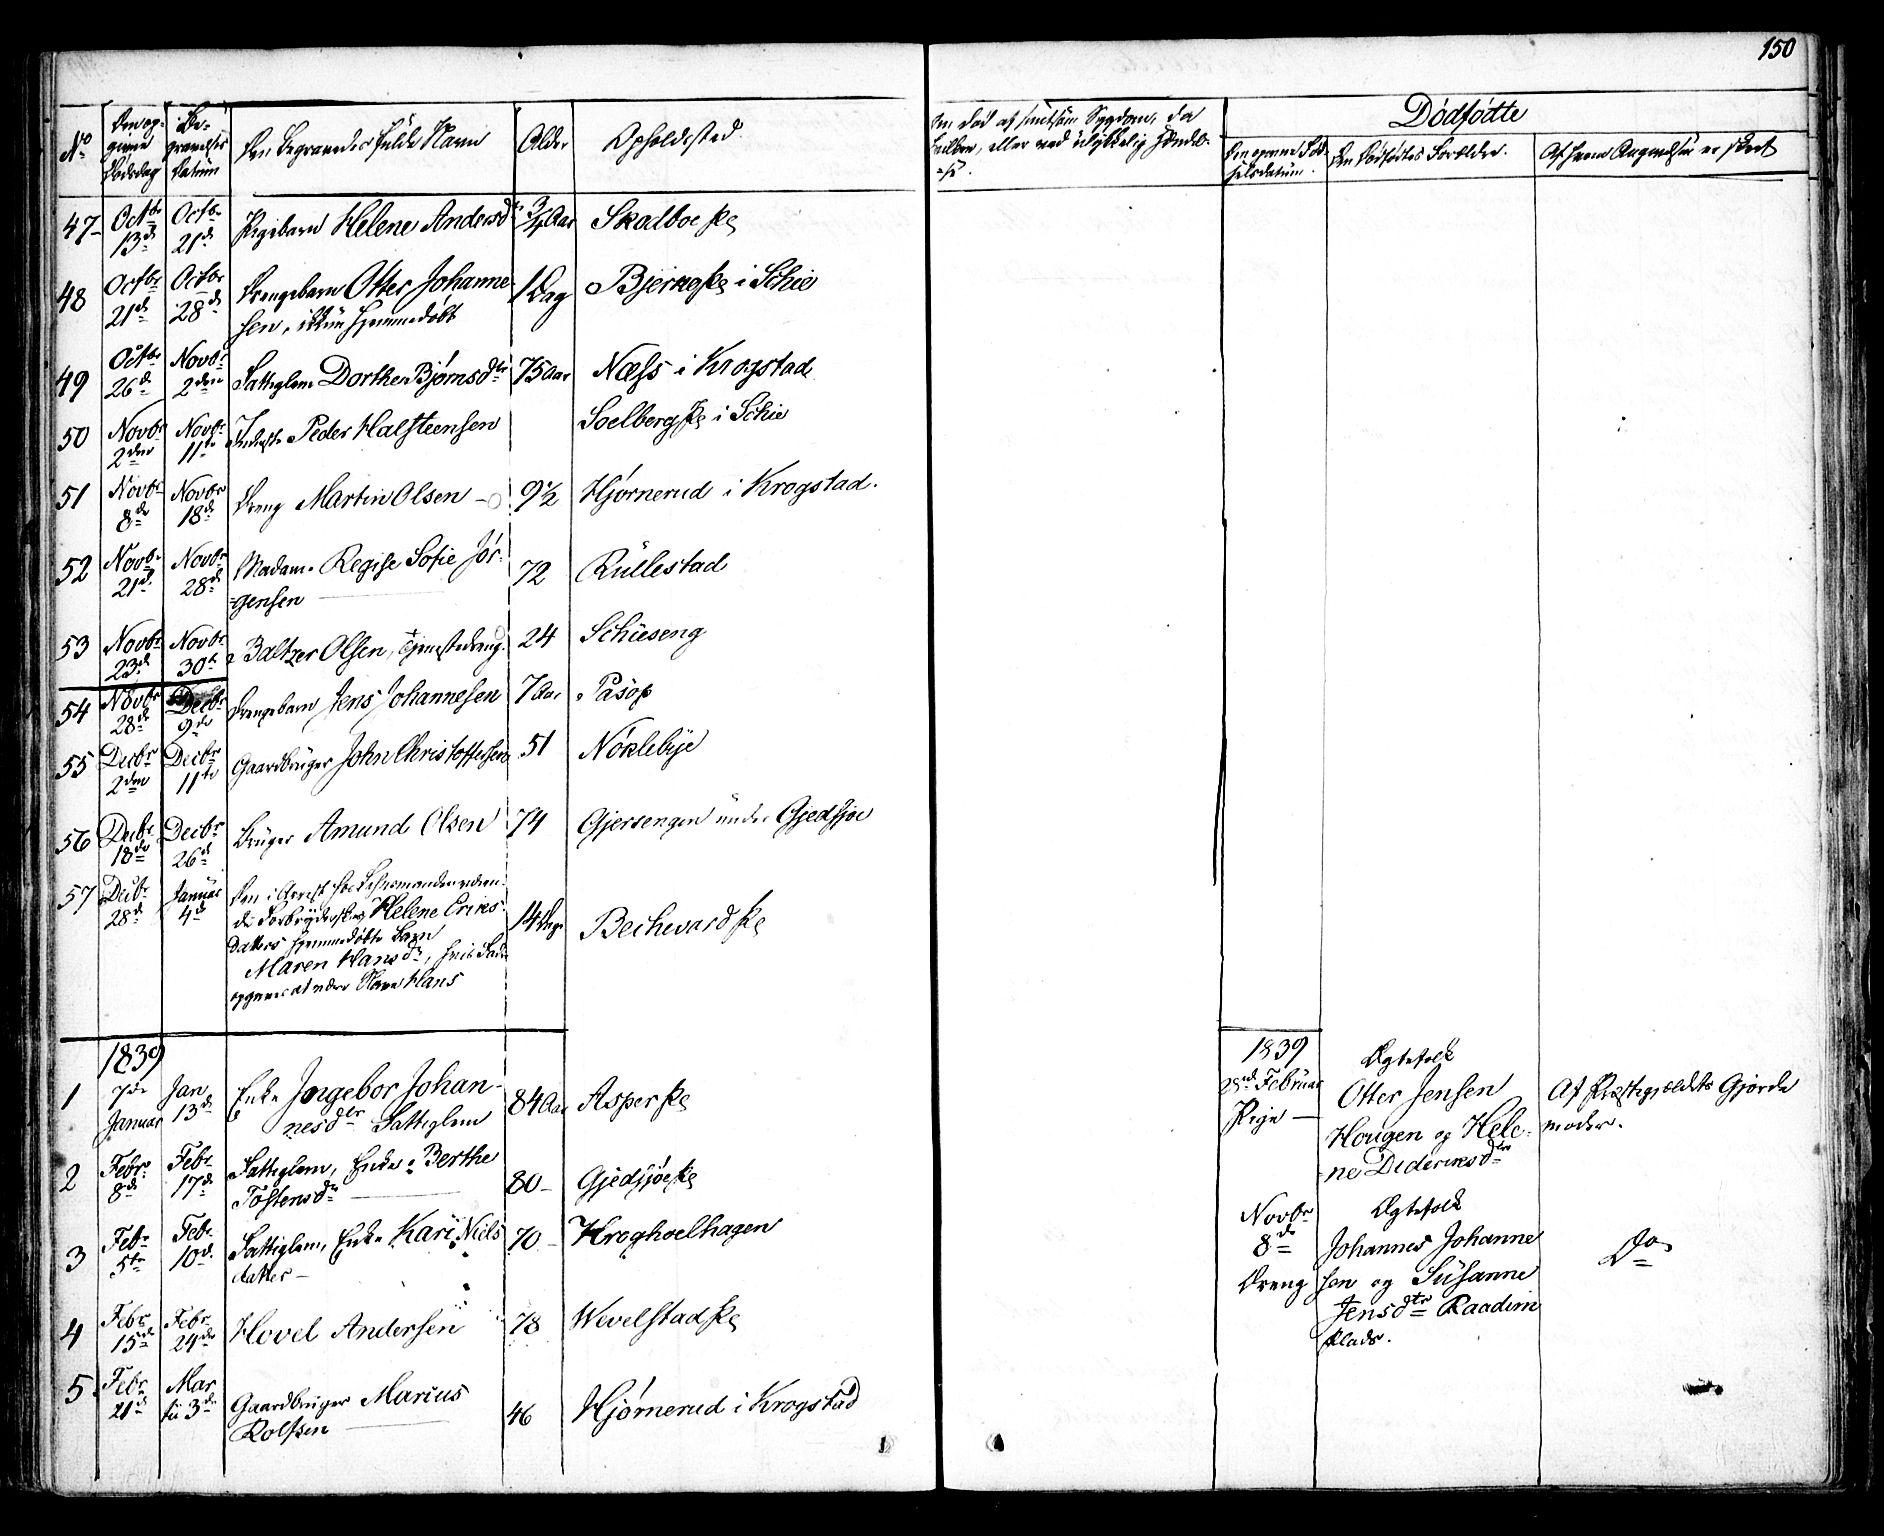 SAO, Kråkstad prestekontor Kirkebøker, F/Fa/L0005: Ministerialbok nr. I 5, 1837-1847, s. 150